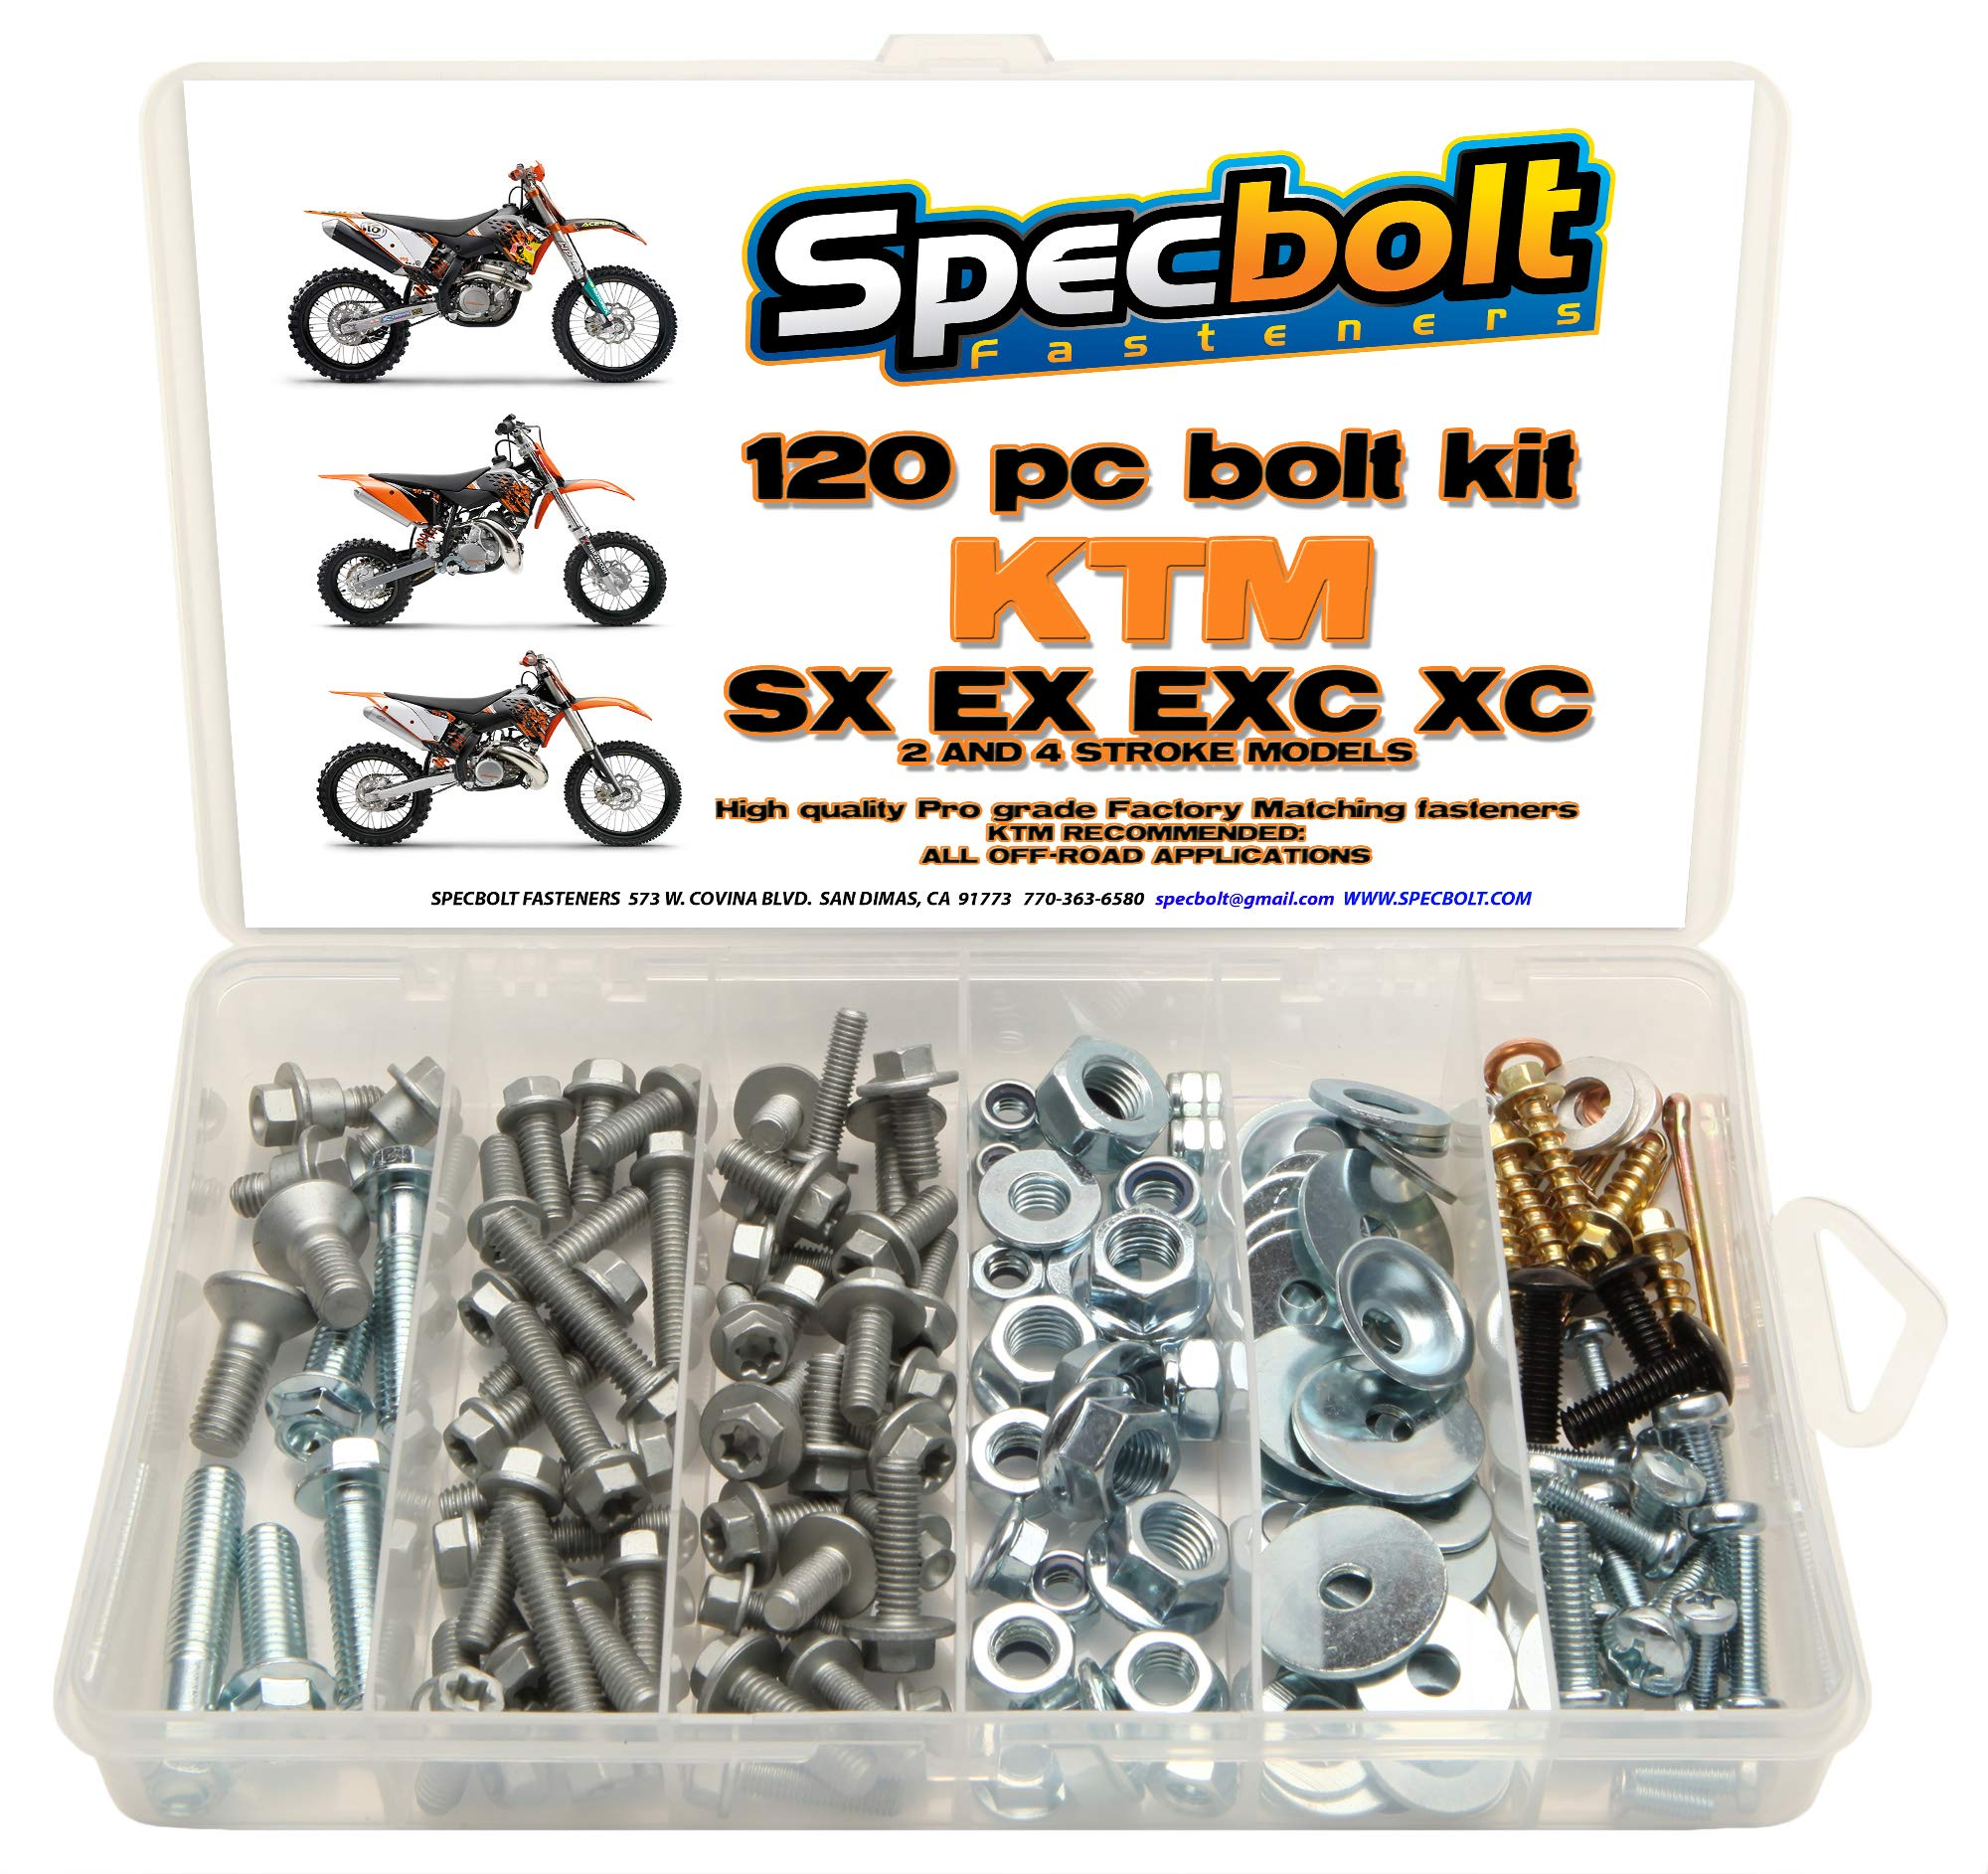 120pc Specbolt KTM SX EX EXC Bolt Kit for Maintenance MX Dirtbike OEM Spec Fastener. This includes 2 STROKES: 50 60 65 85 105 125 250 300 360 380 550 4 STROKES: 250 350 400 450 500 520 525 530 620 640 by Specbolt Fasteners